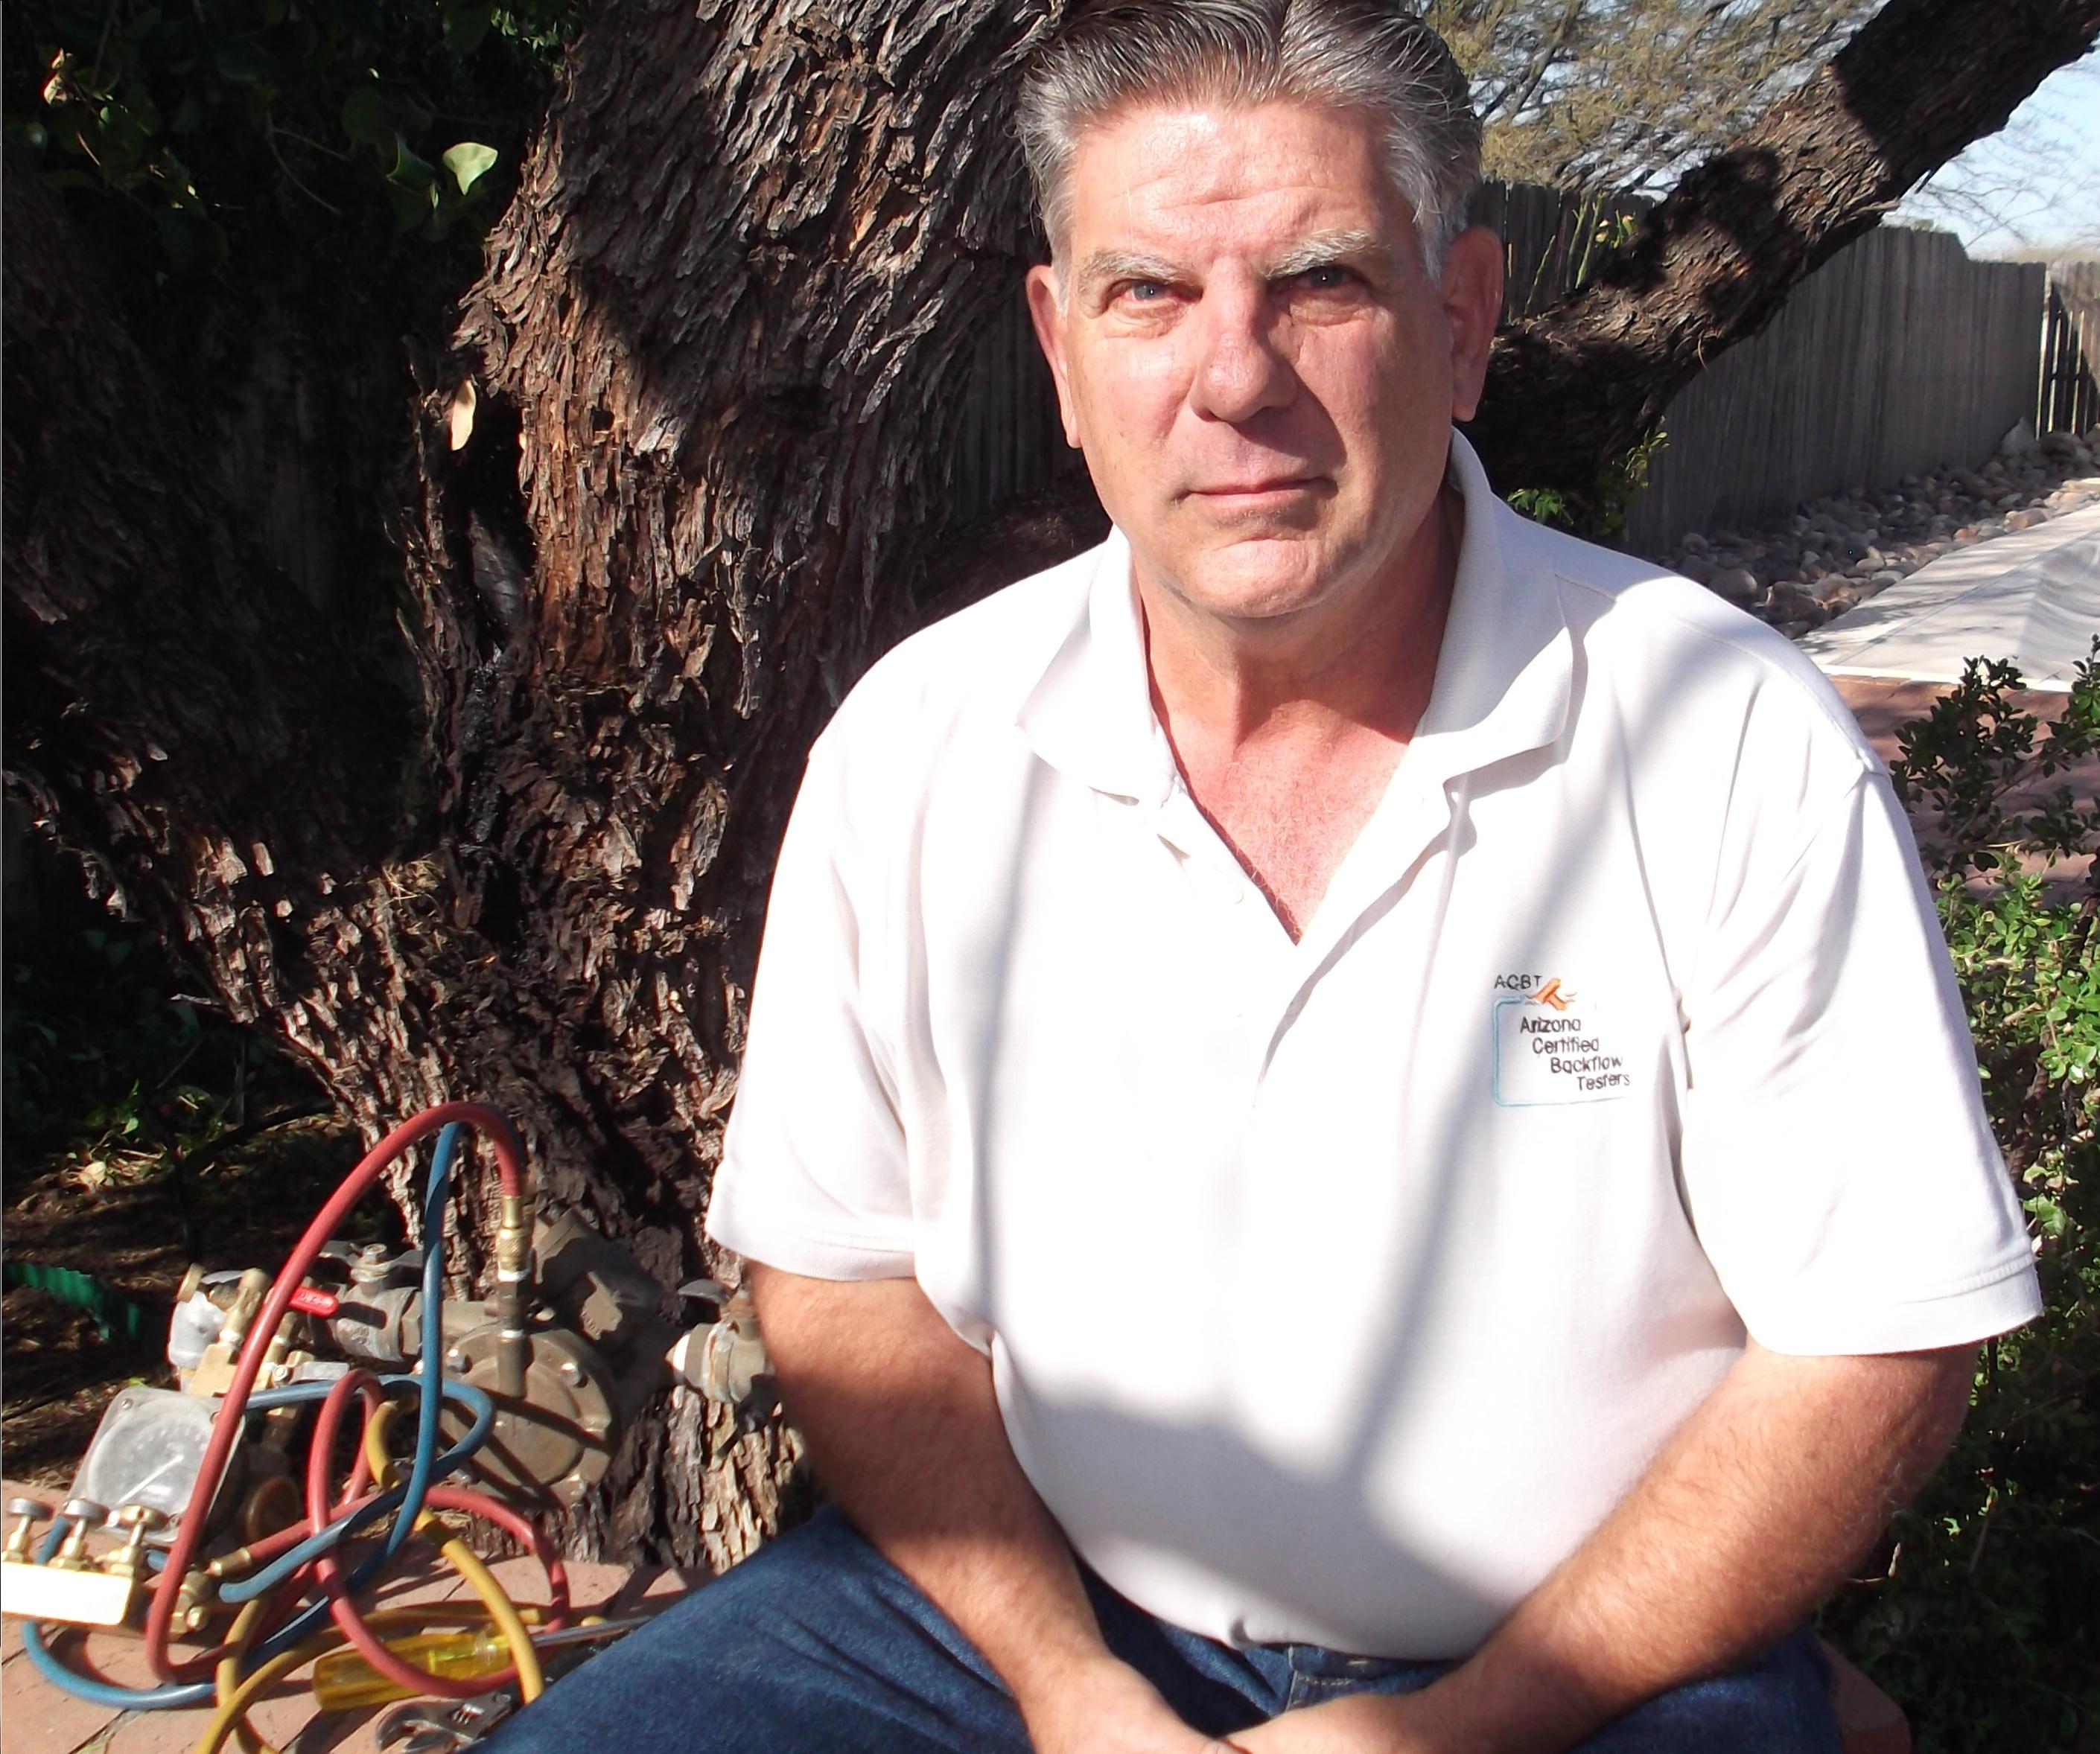 Arizona Certified Backflow Testers LLC